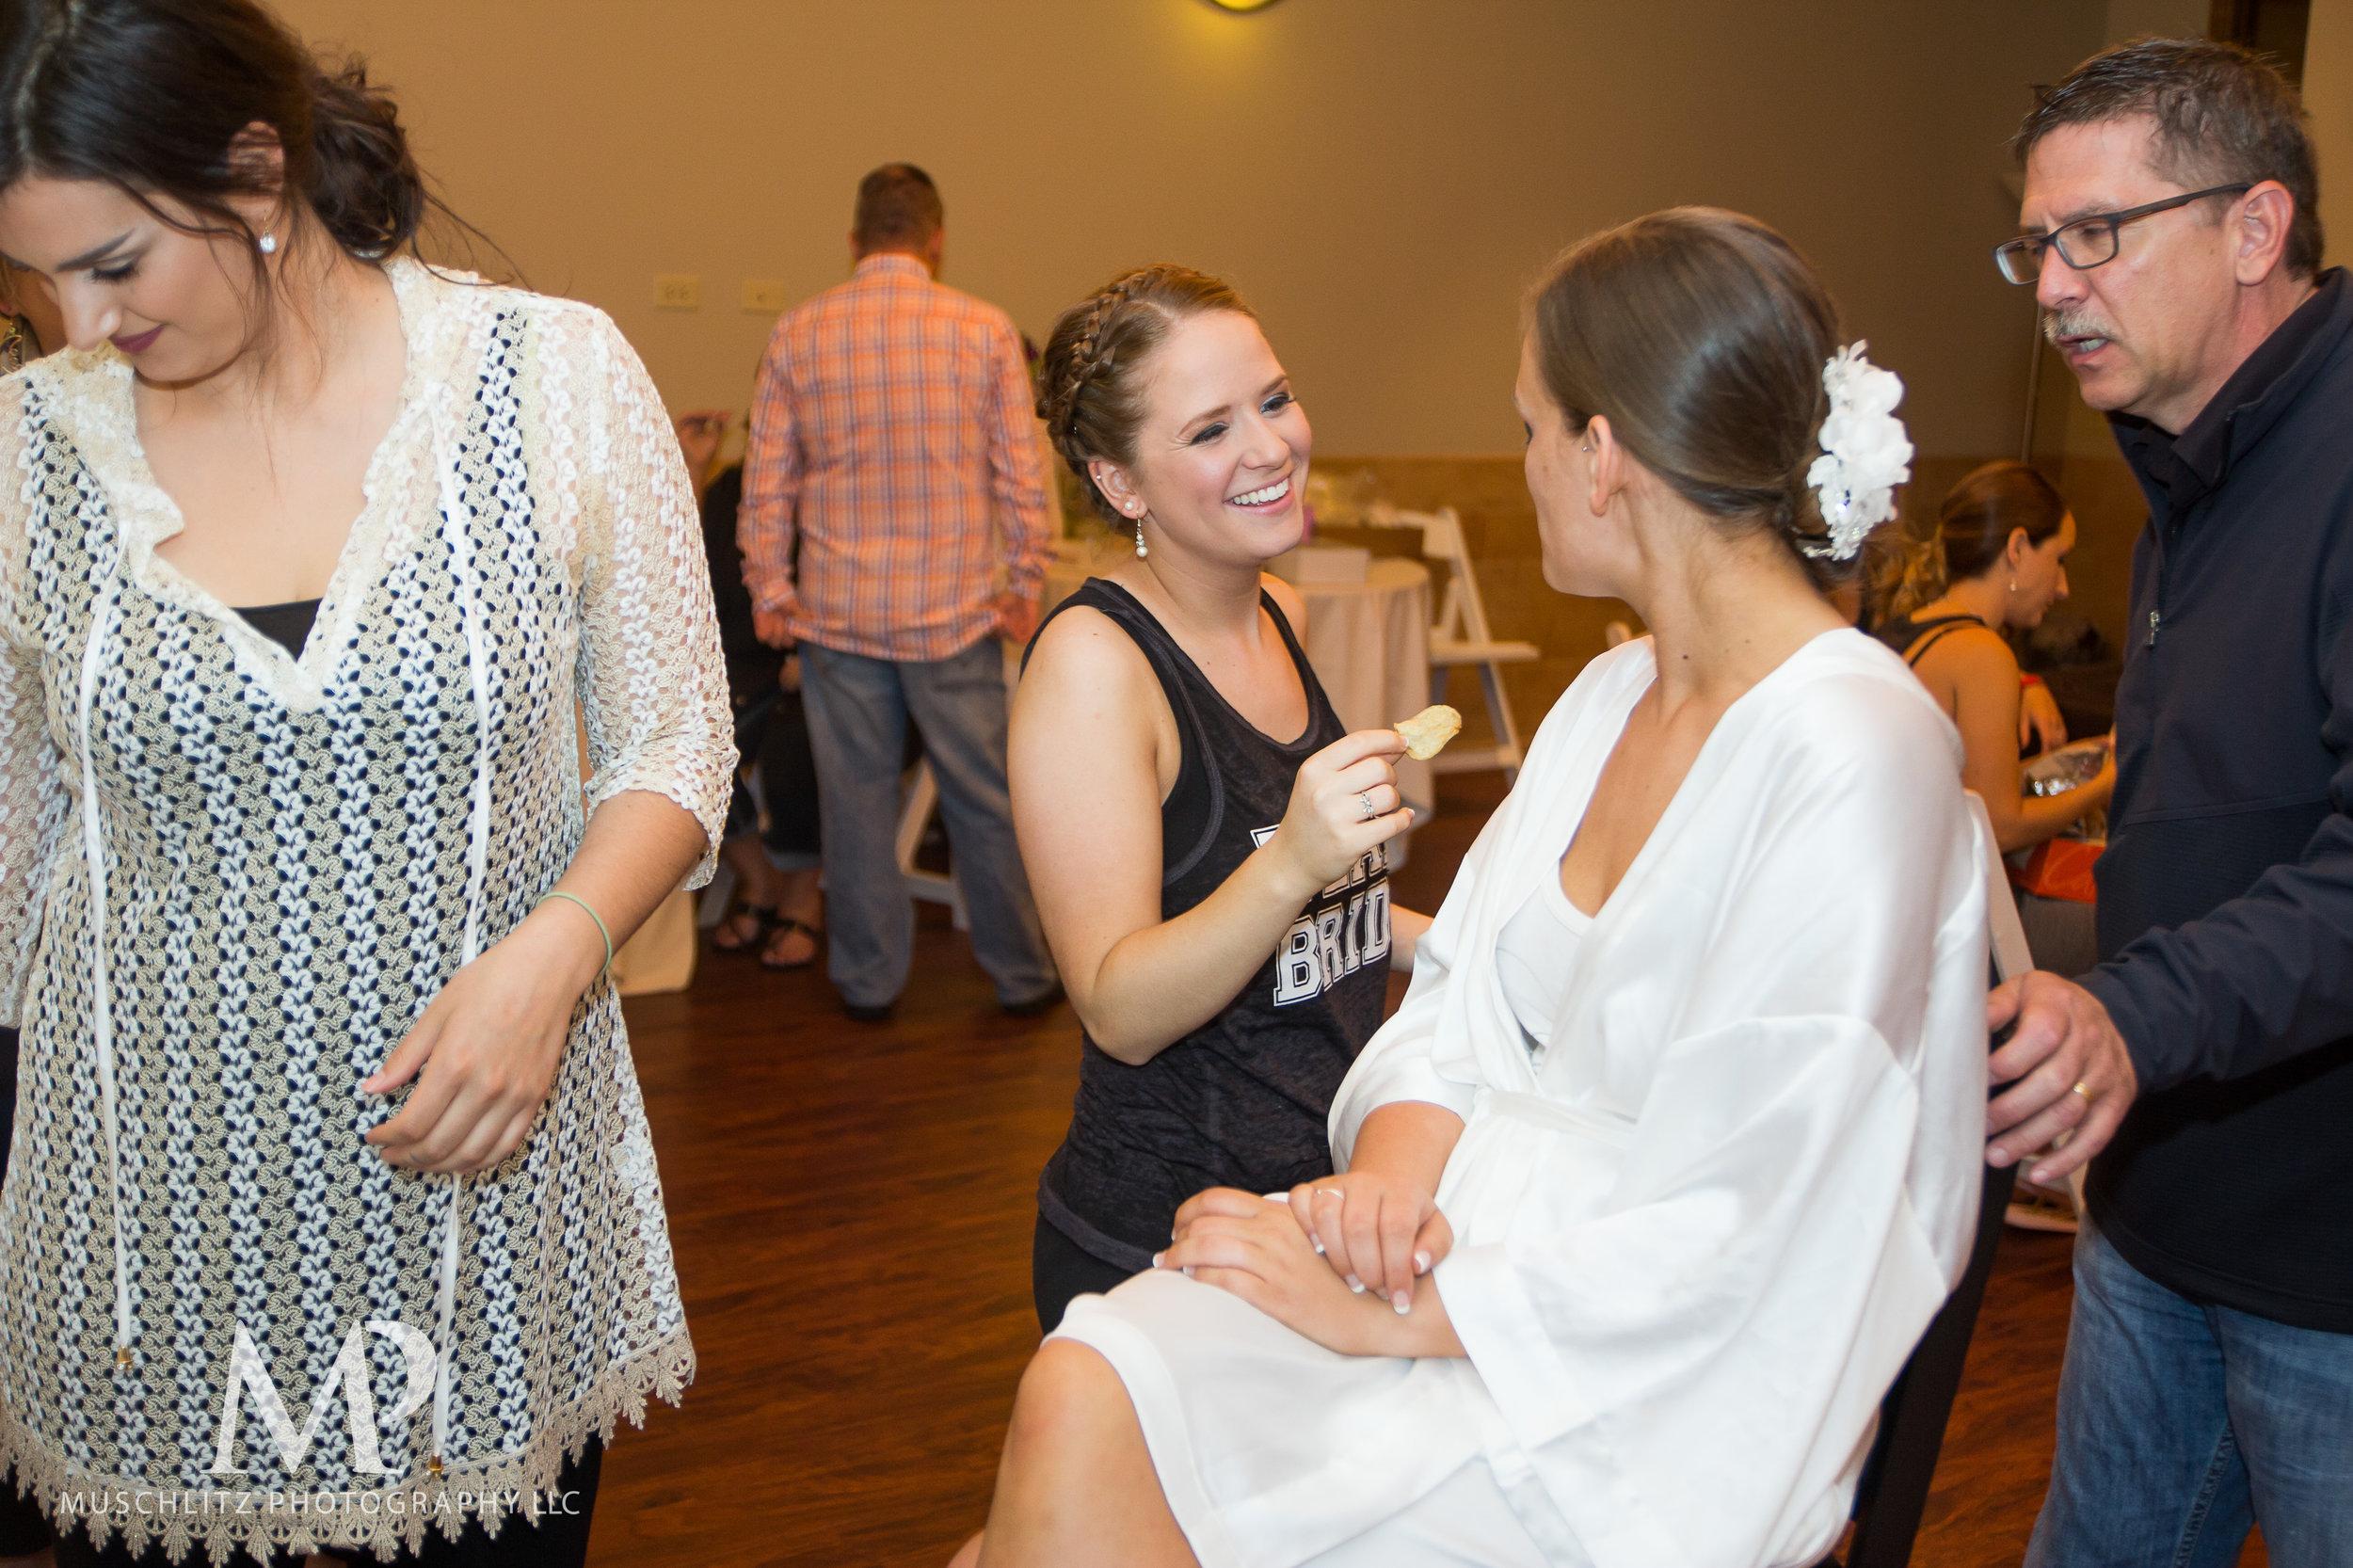 club-at-corazon-wedding-ceremony-reception-columbus-dublin-ohio-ohio-university-theme-006.JPG